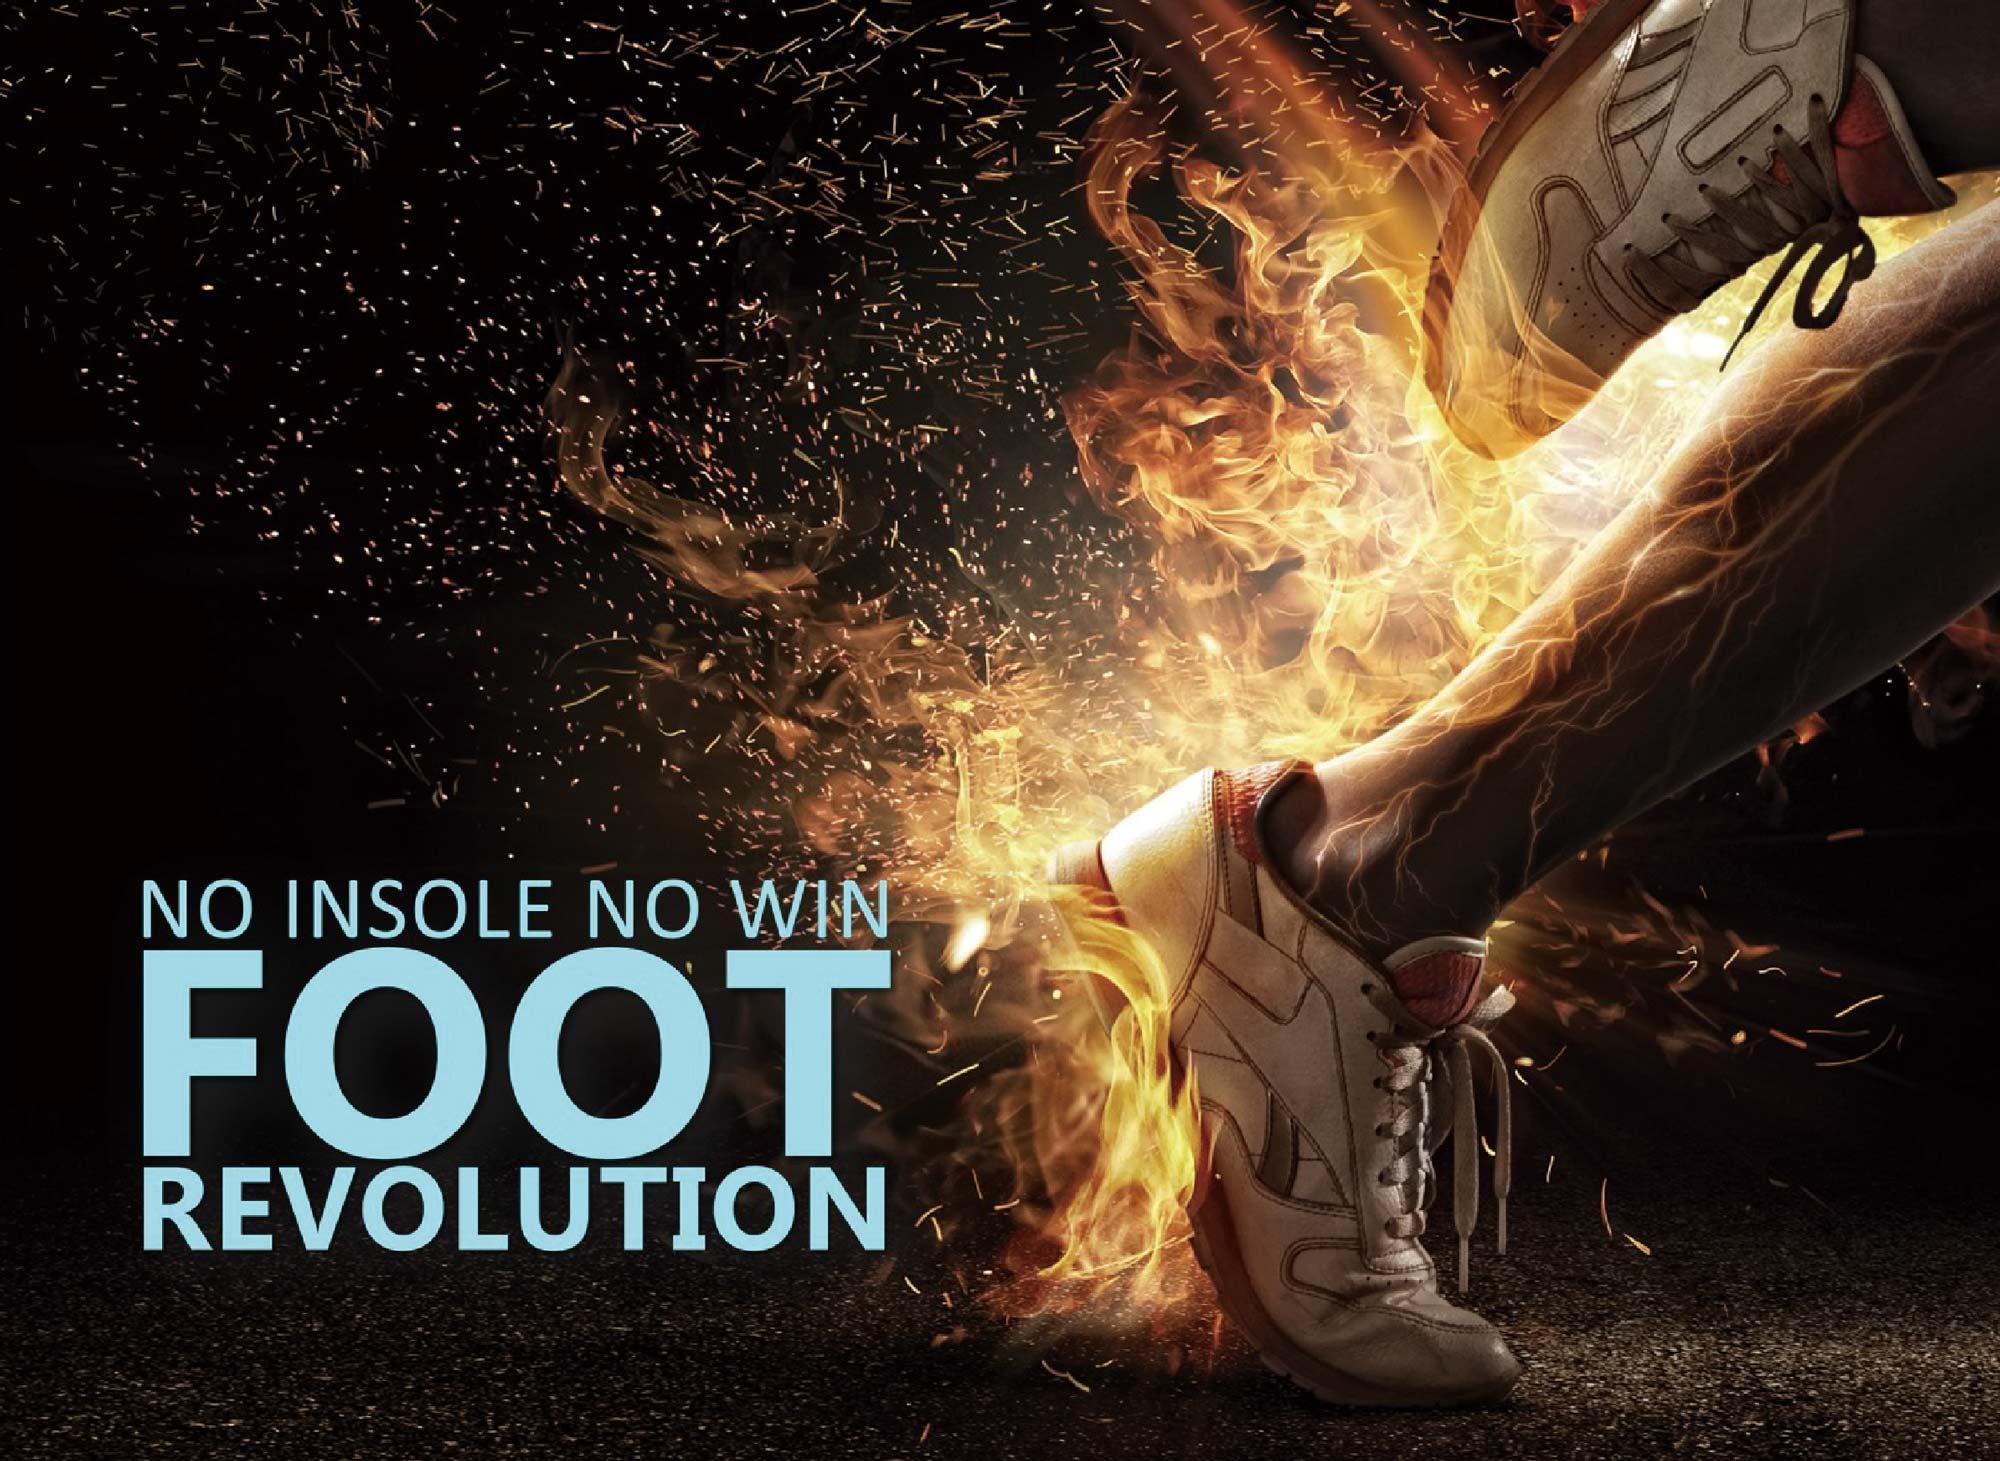 NO INSOLE NO WIN FOOT REVOLUTION